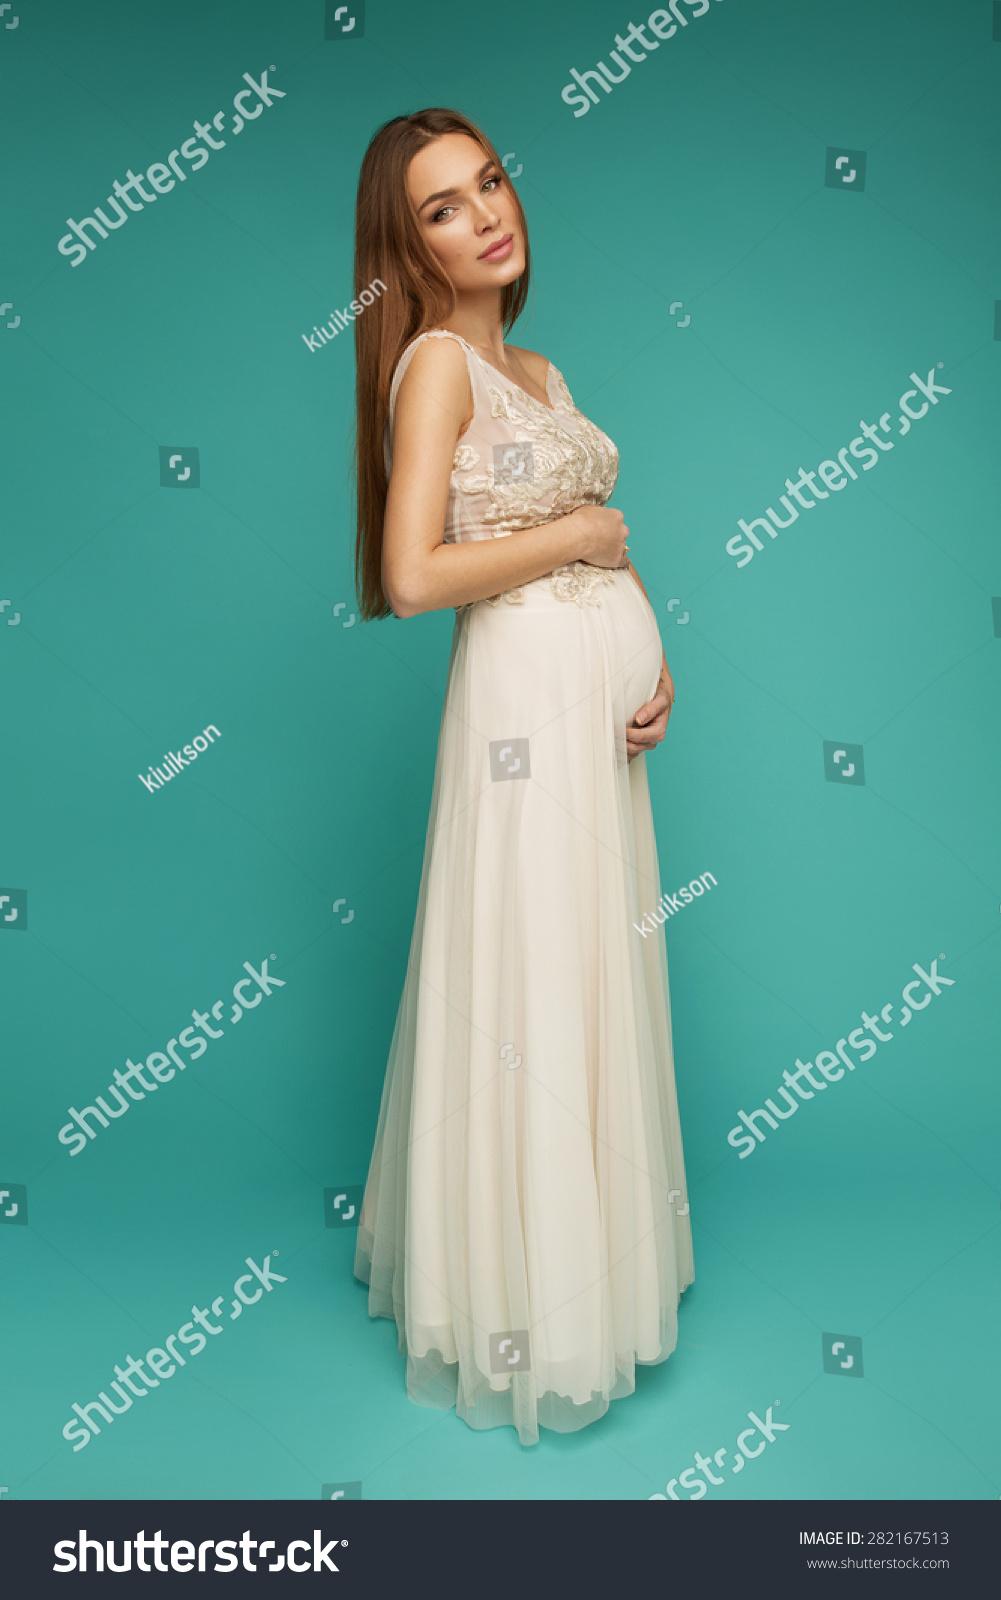 Beautiful Woman Pregnant Stock Photo (Royalty Free) 282167513 ...